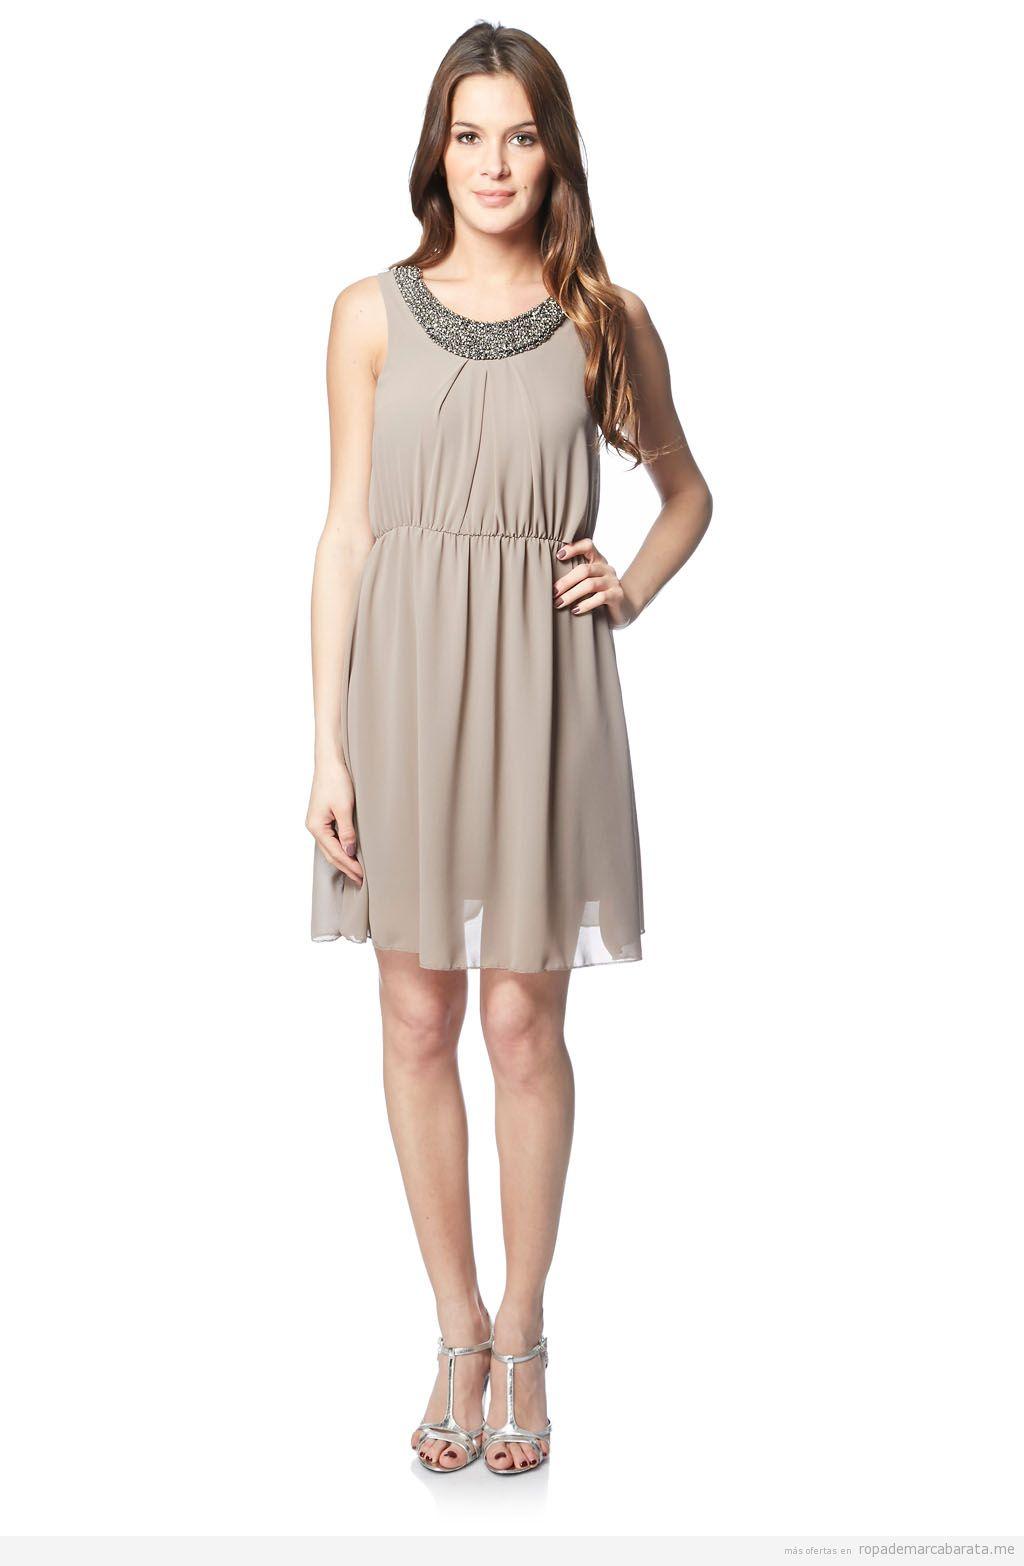 Vestido marca Mademoiselle Lola barata, comprar outlet online